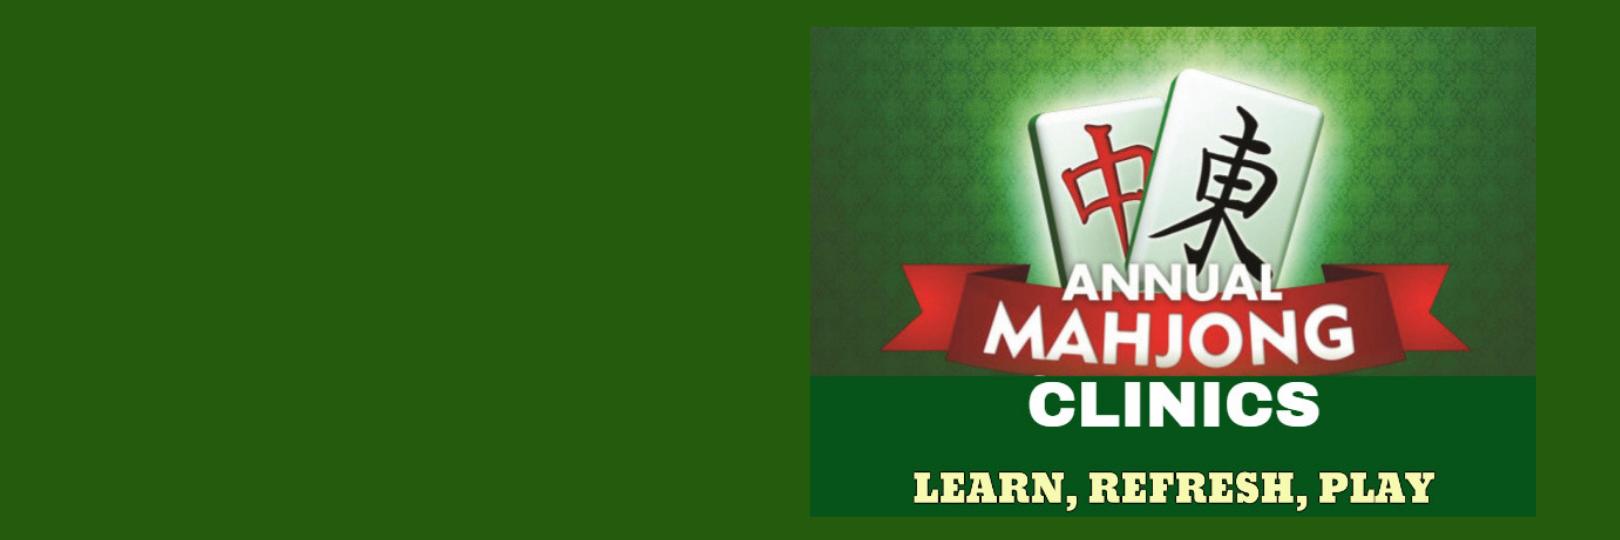 "<a href=""https://images.shulcloud.com/13600/uploads/uploaded_images/Mahjong%20Clinics%202019.jpg""                                     target="""">                                                                 <span class=""slider_title"">                                     Mahjong Clinics                                </span>                                                                 </a>                                                                                                                                                                                       <span class=""slider_description"">Wednesday, September 4, 11 and 18  7:00 PM, FREE</span>                                                                                     <a href=""https://images.shulcloud.com/13600/uploads/uploaded_images/Mahjong%20Clinics%202019.jpg"" class=""slider_link""                             target="""">                             More Details                            </a>"